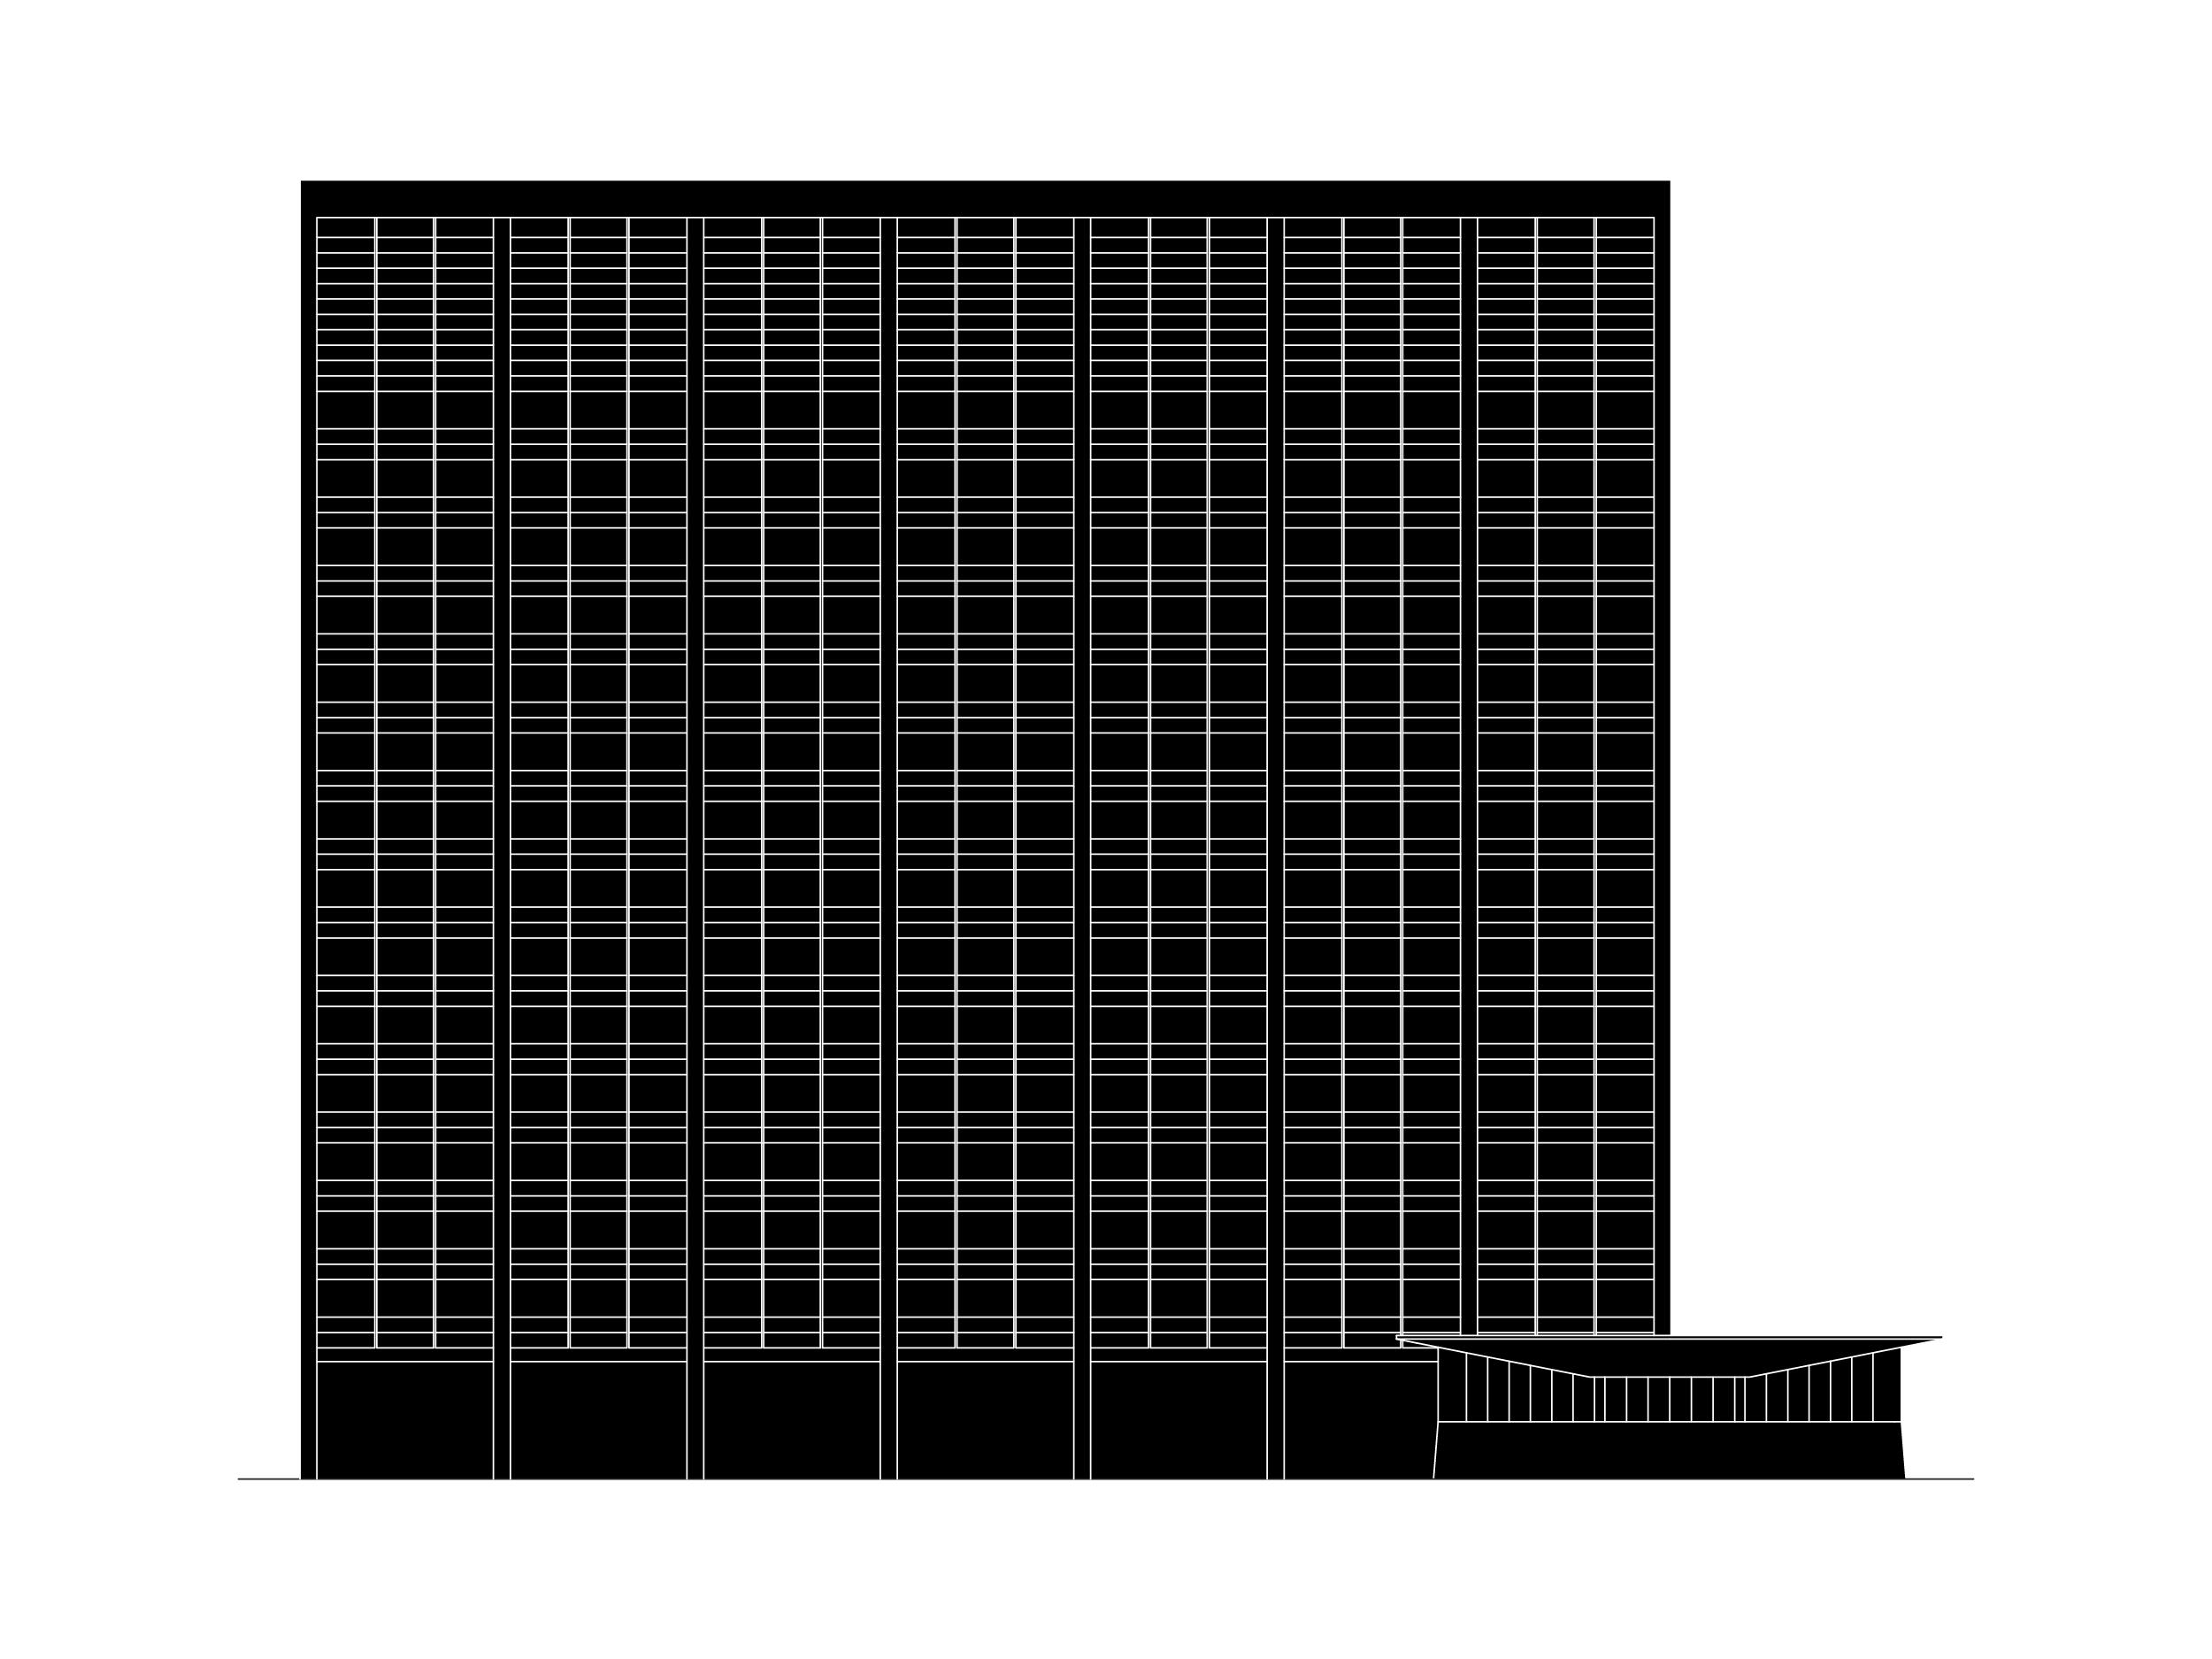 Høyblokka Revisited Drawing